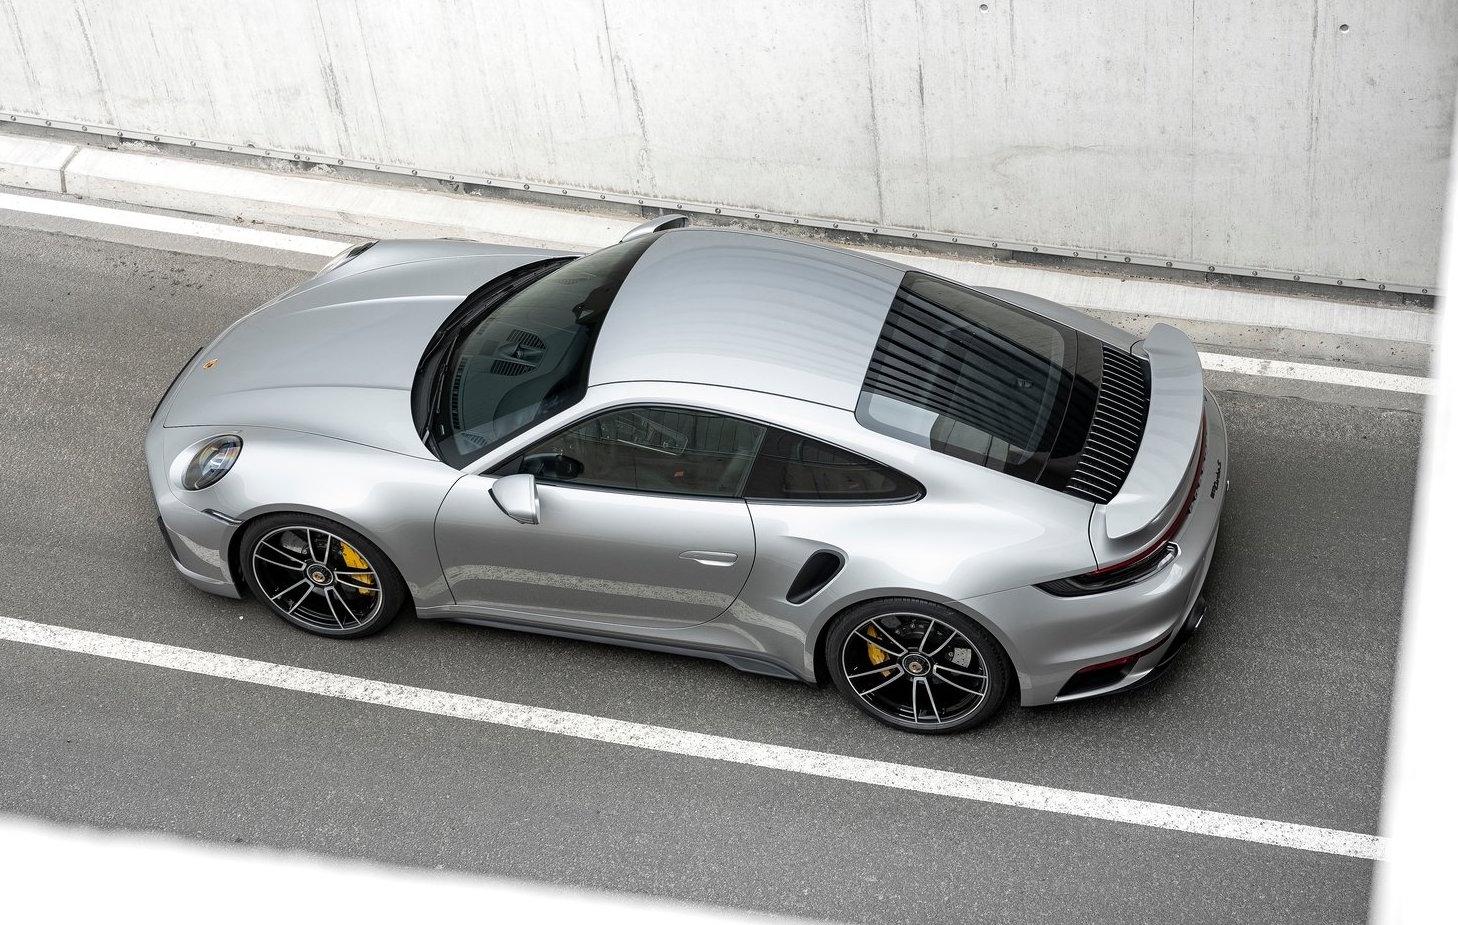 2021 Porsche 911 Turbo S Getting Lightweight Sport Pack Options Performancedrive